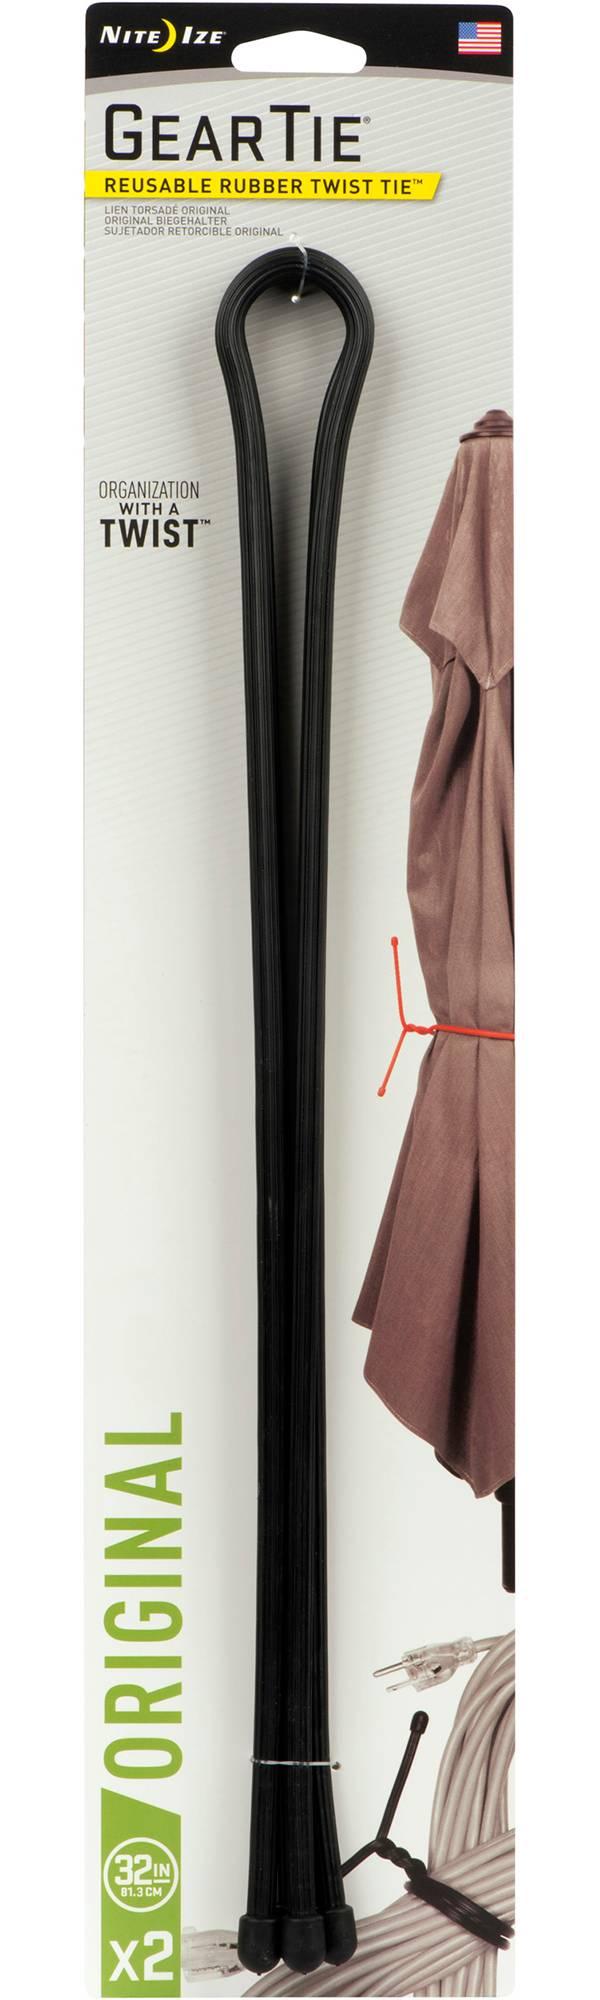 "Nite Ize 32"" Gear Tie product image"